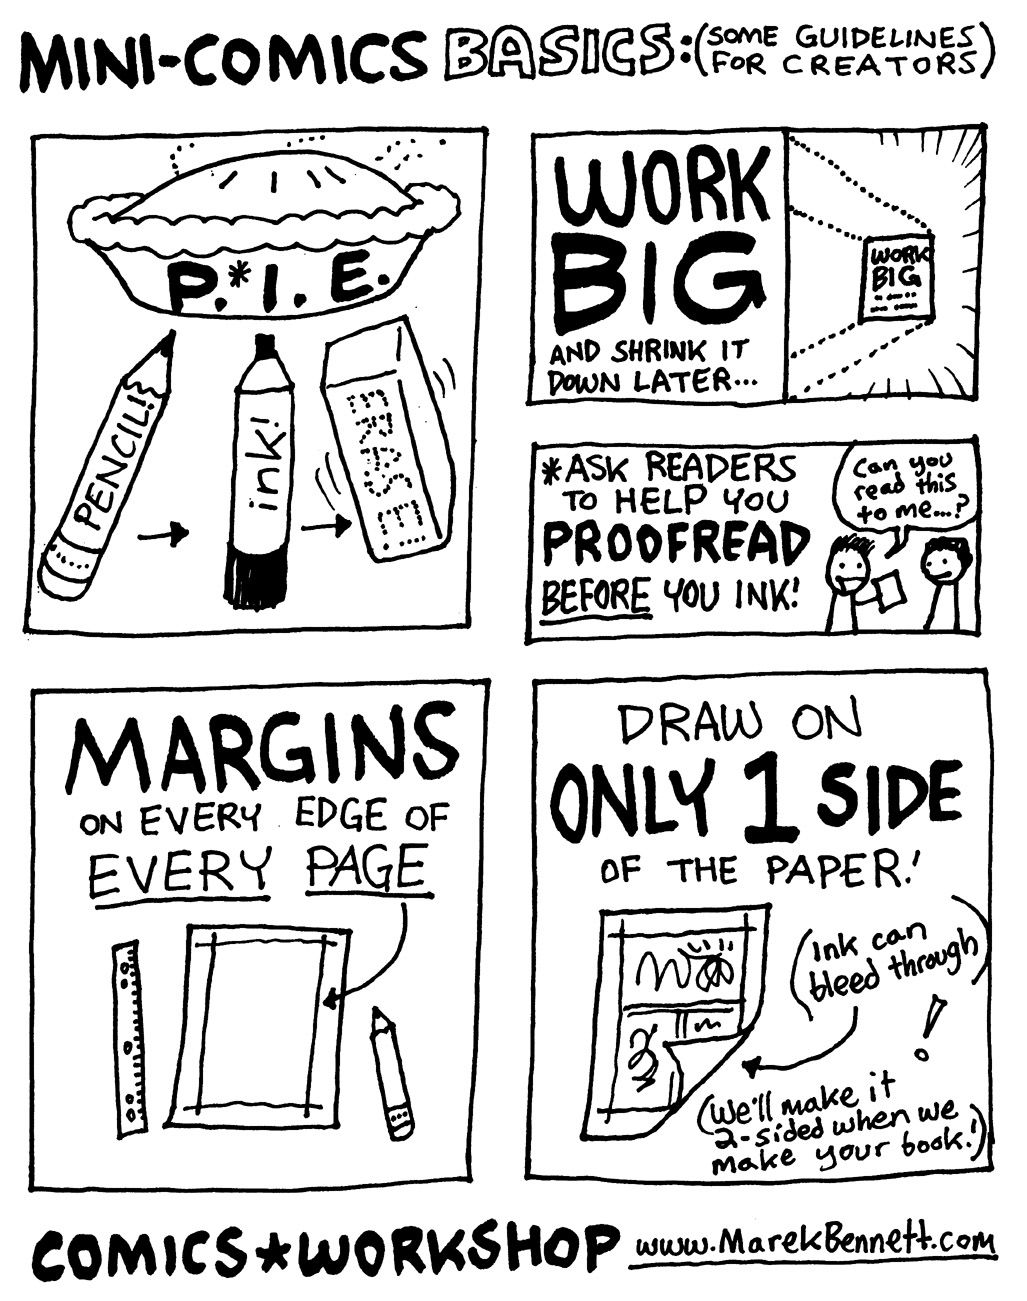 Mini-Comic Basics-Guidelines For Creators